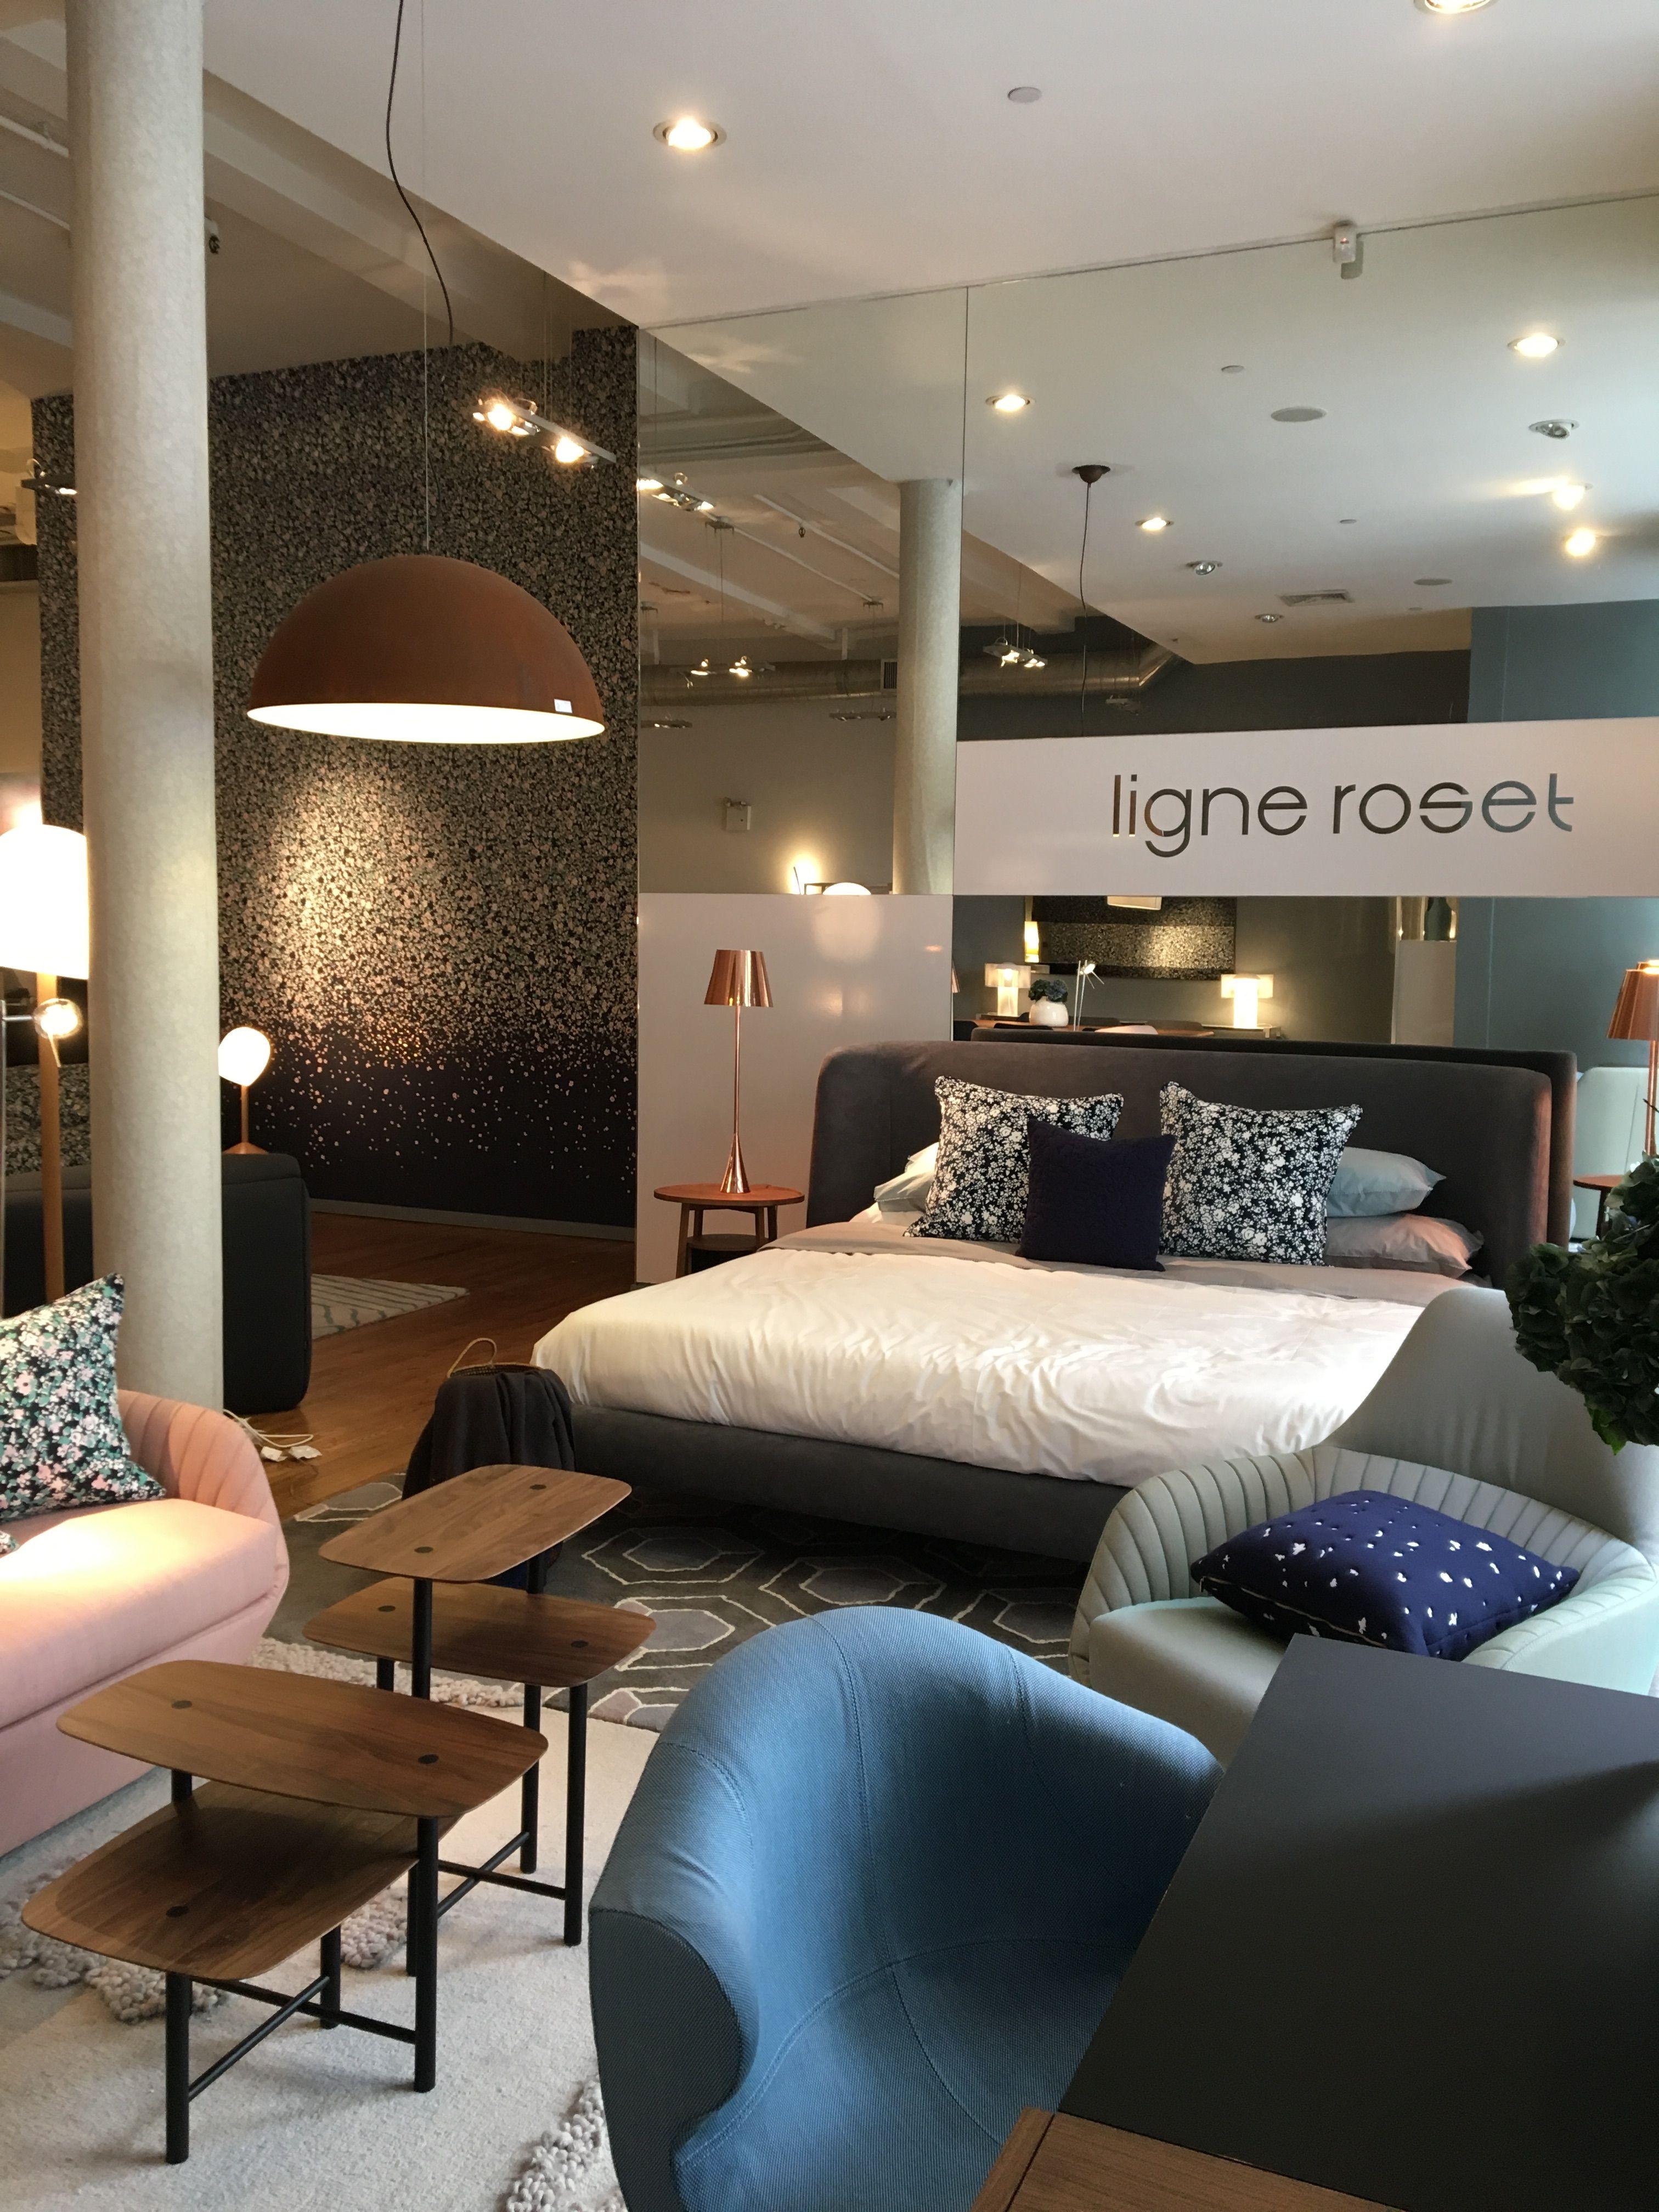 at ligne roset soho for nycxdesign to celebrate the debut of 2lg x custhom for ligne roset. Black Bedroom Furniture Sets. Home Design Ideas